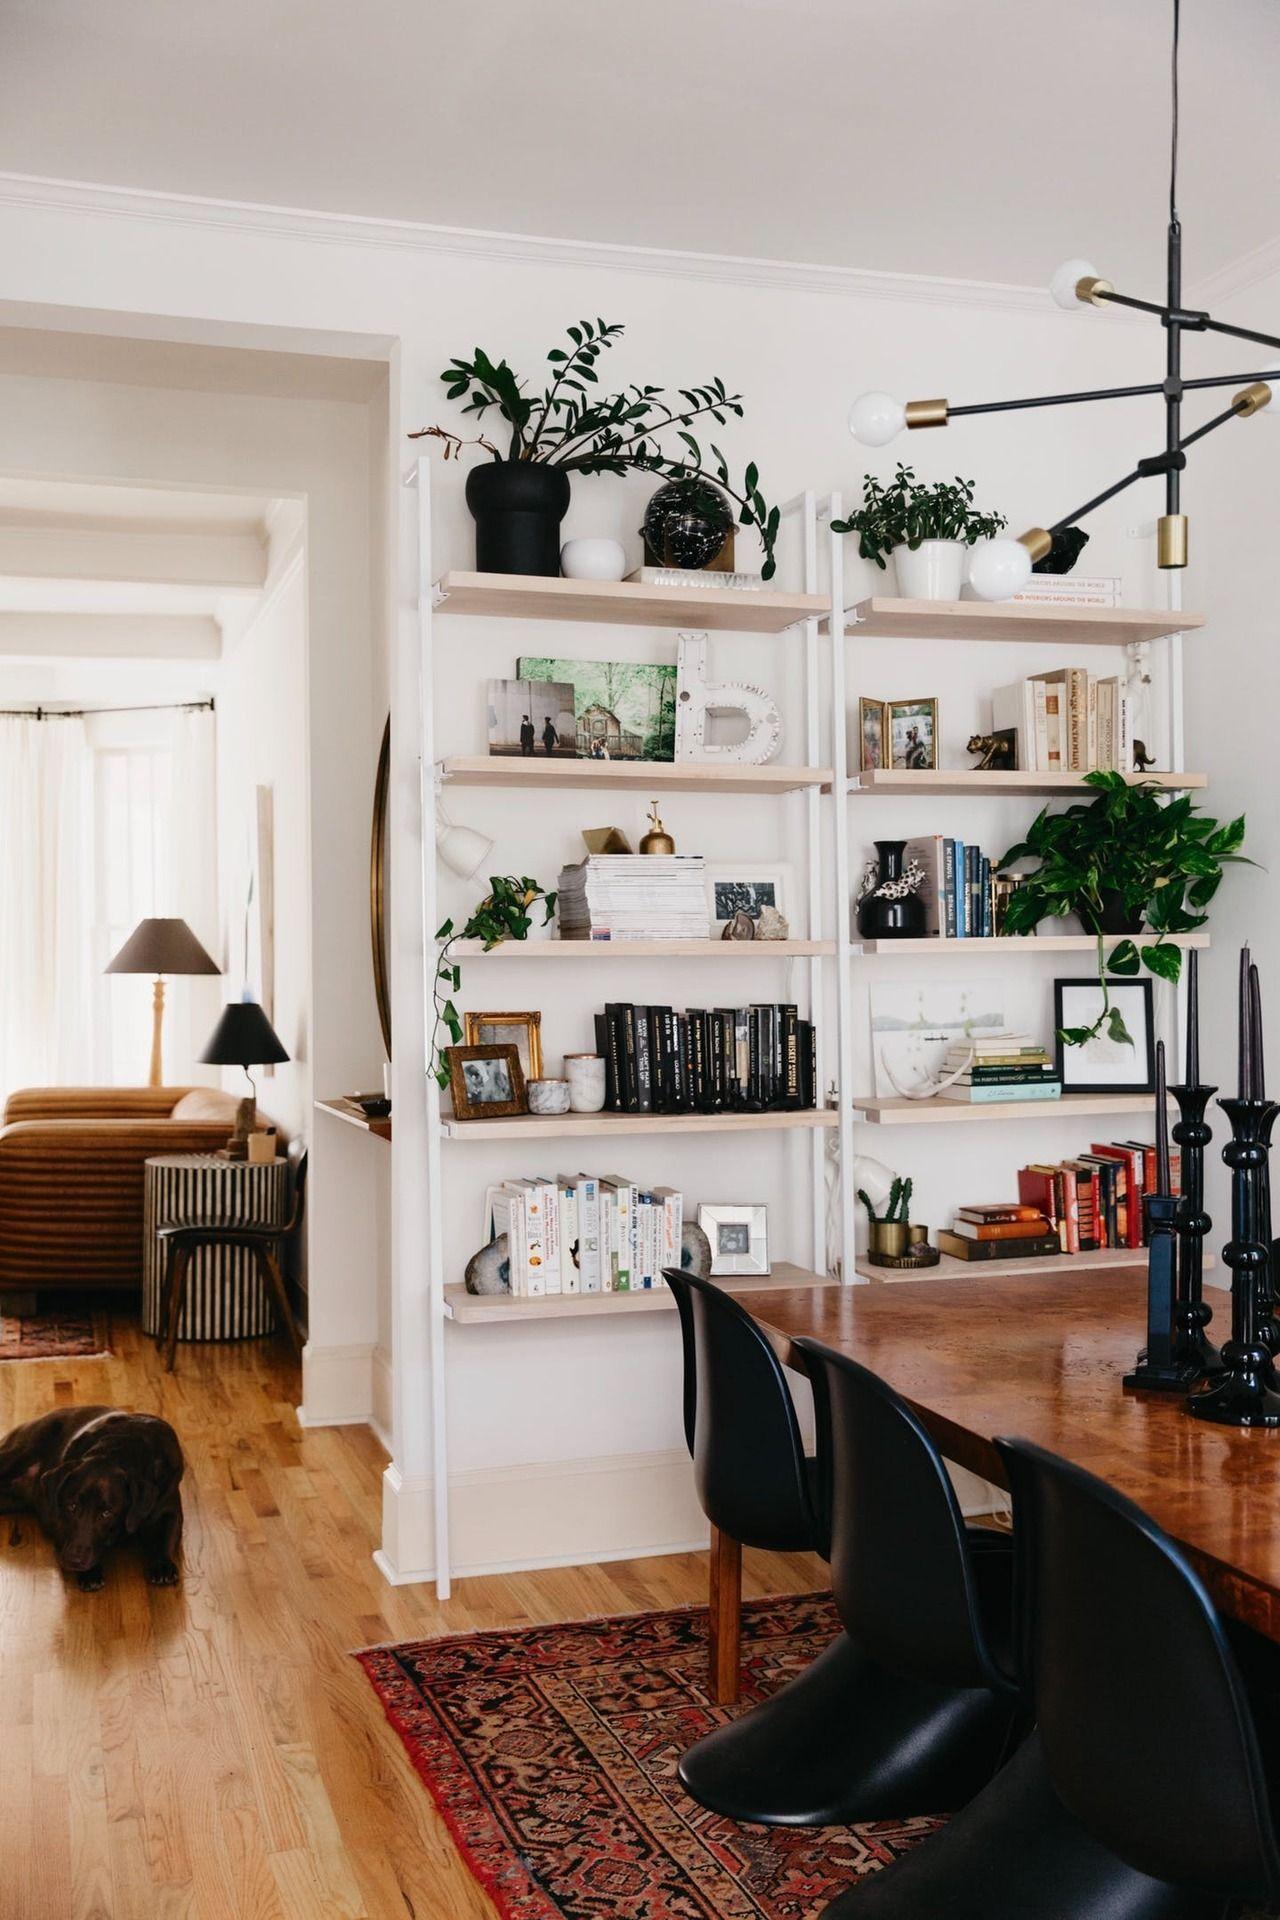 gravity home home decor in 2019 home home decor loft house rh pinterest com